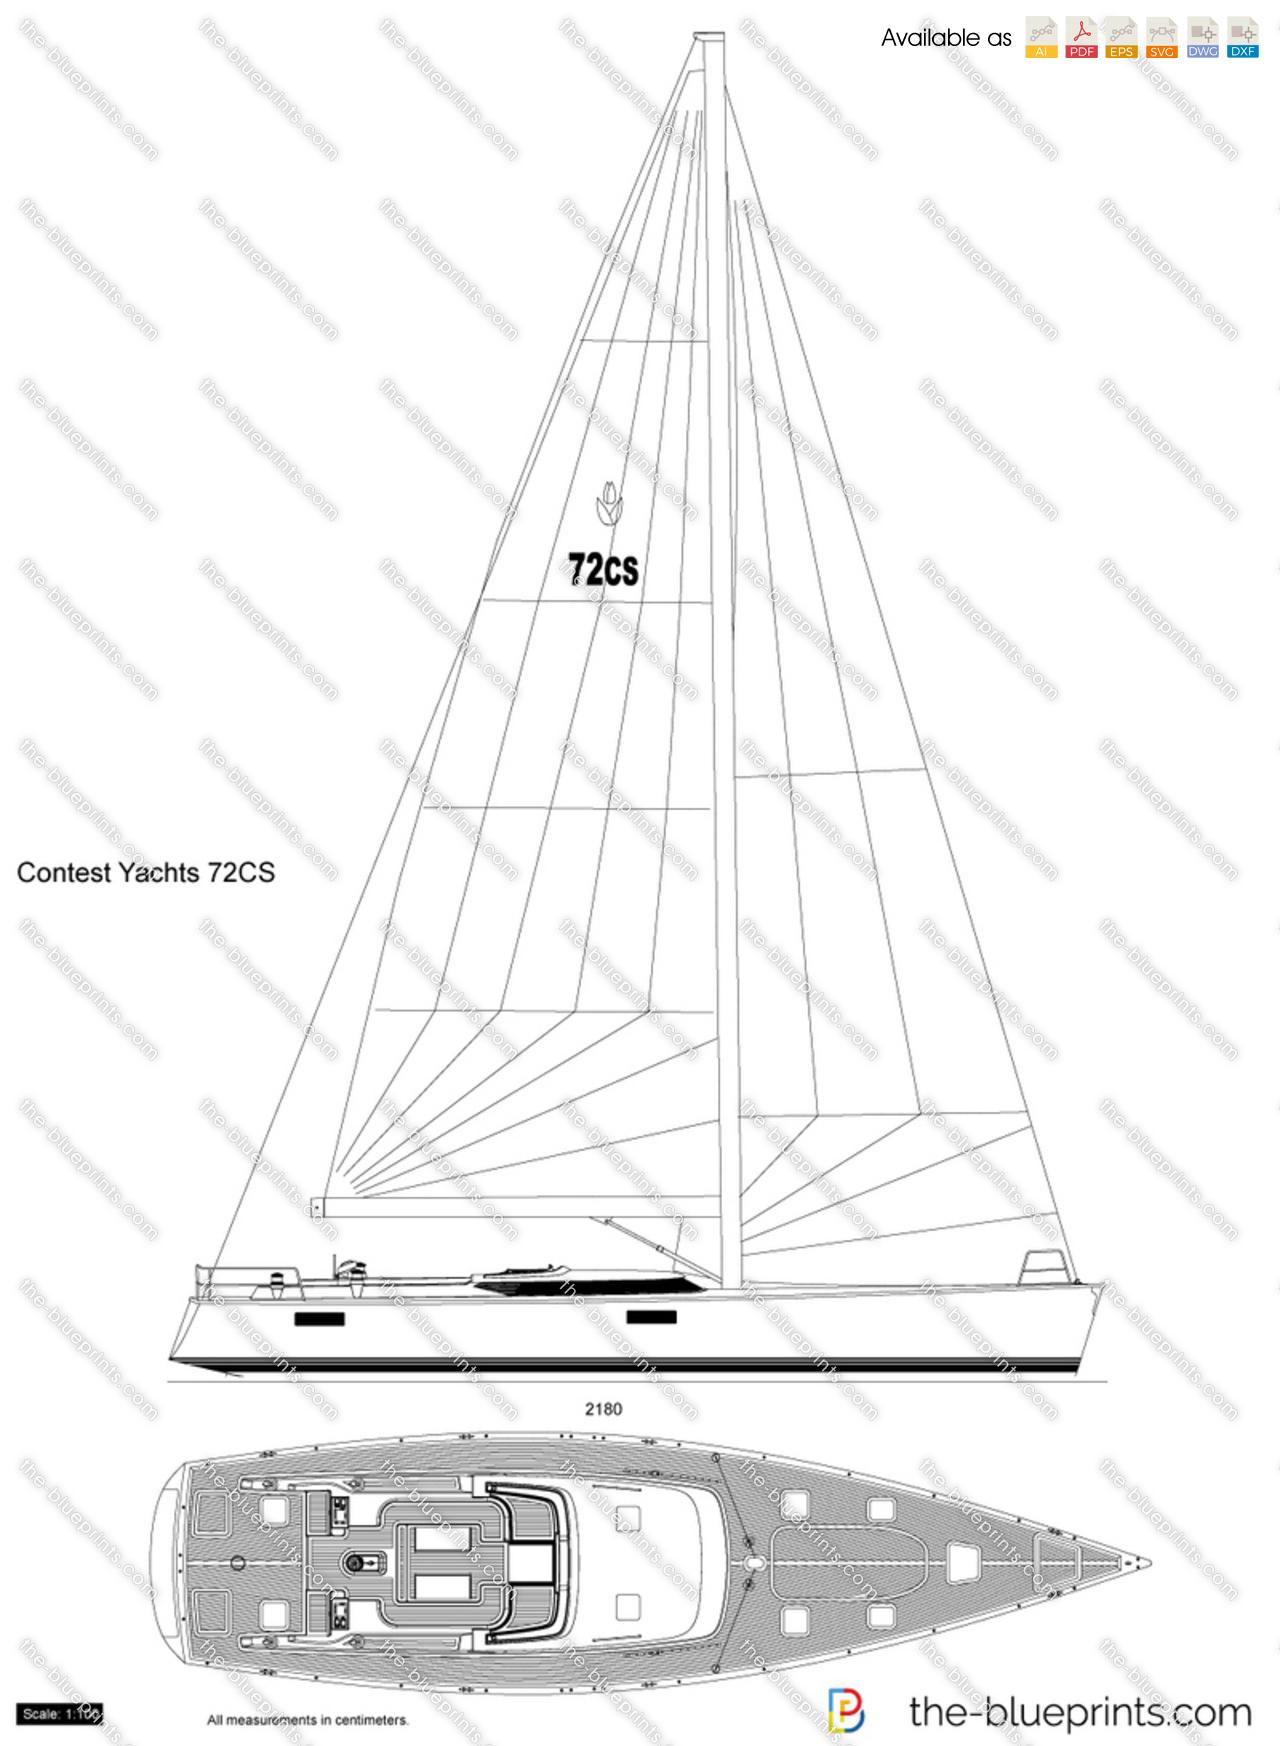 Contest Yachts 72CS